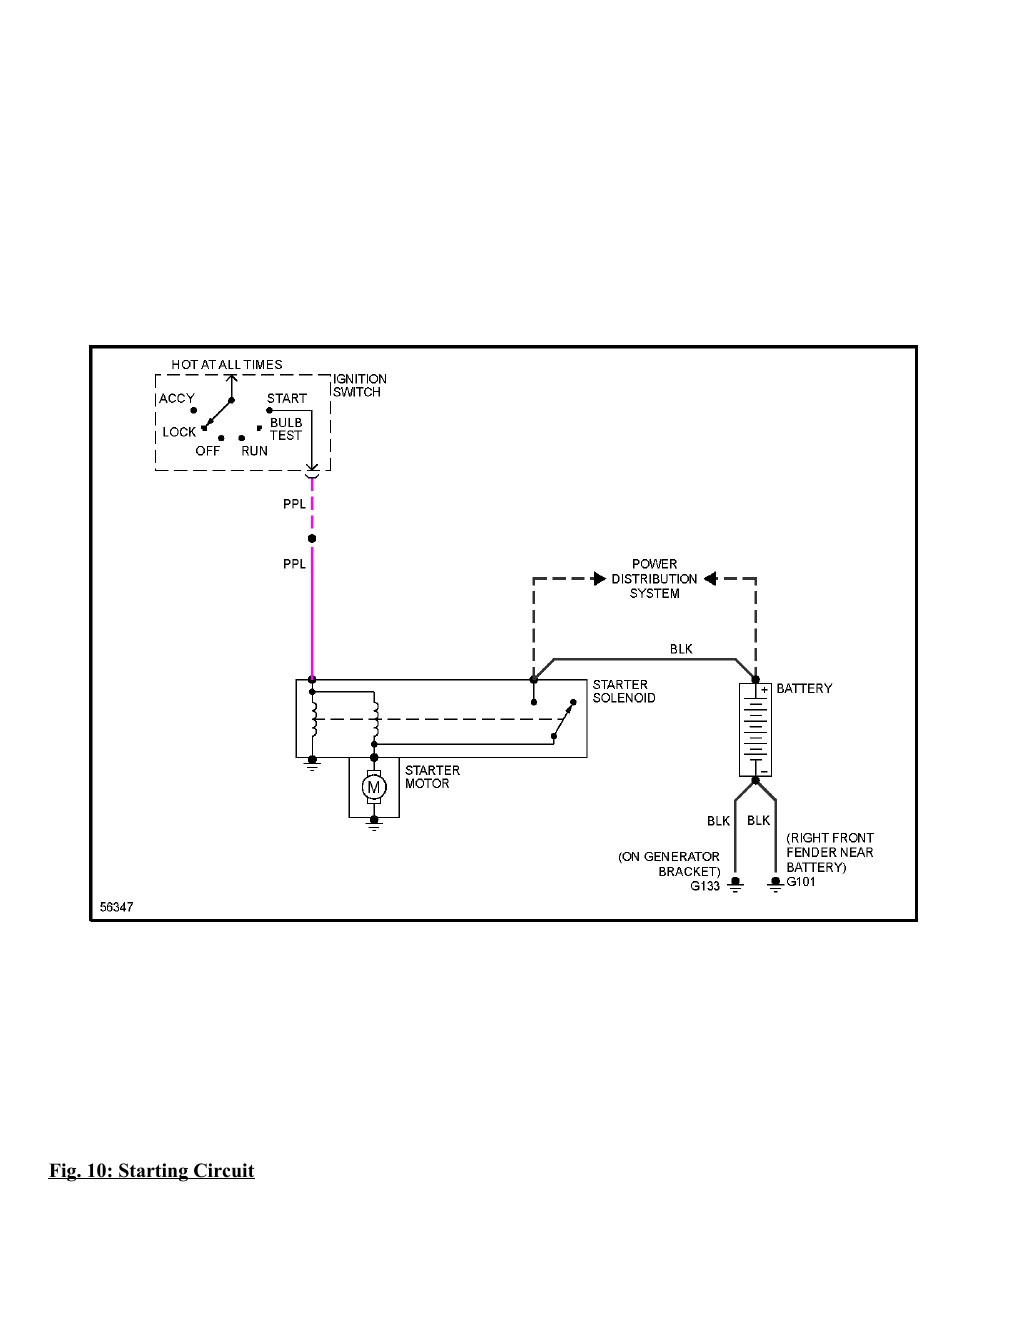 medium resolution of 2001 monte carlo wiring diagram also 2000 monte carlo wiring diagram 2001 chevy monte carlo engine